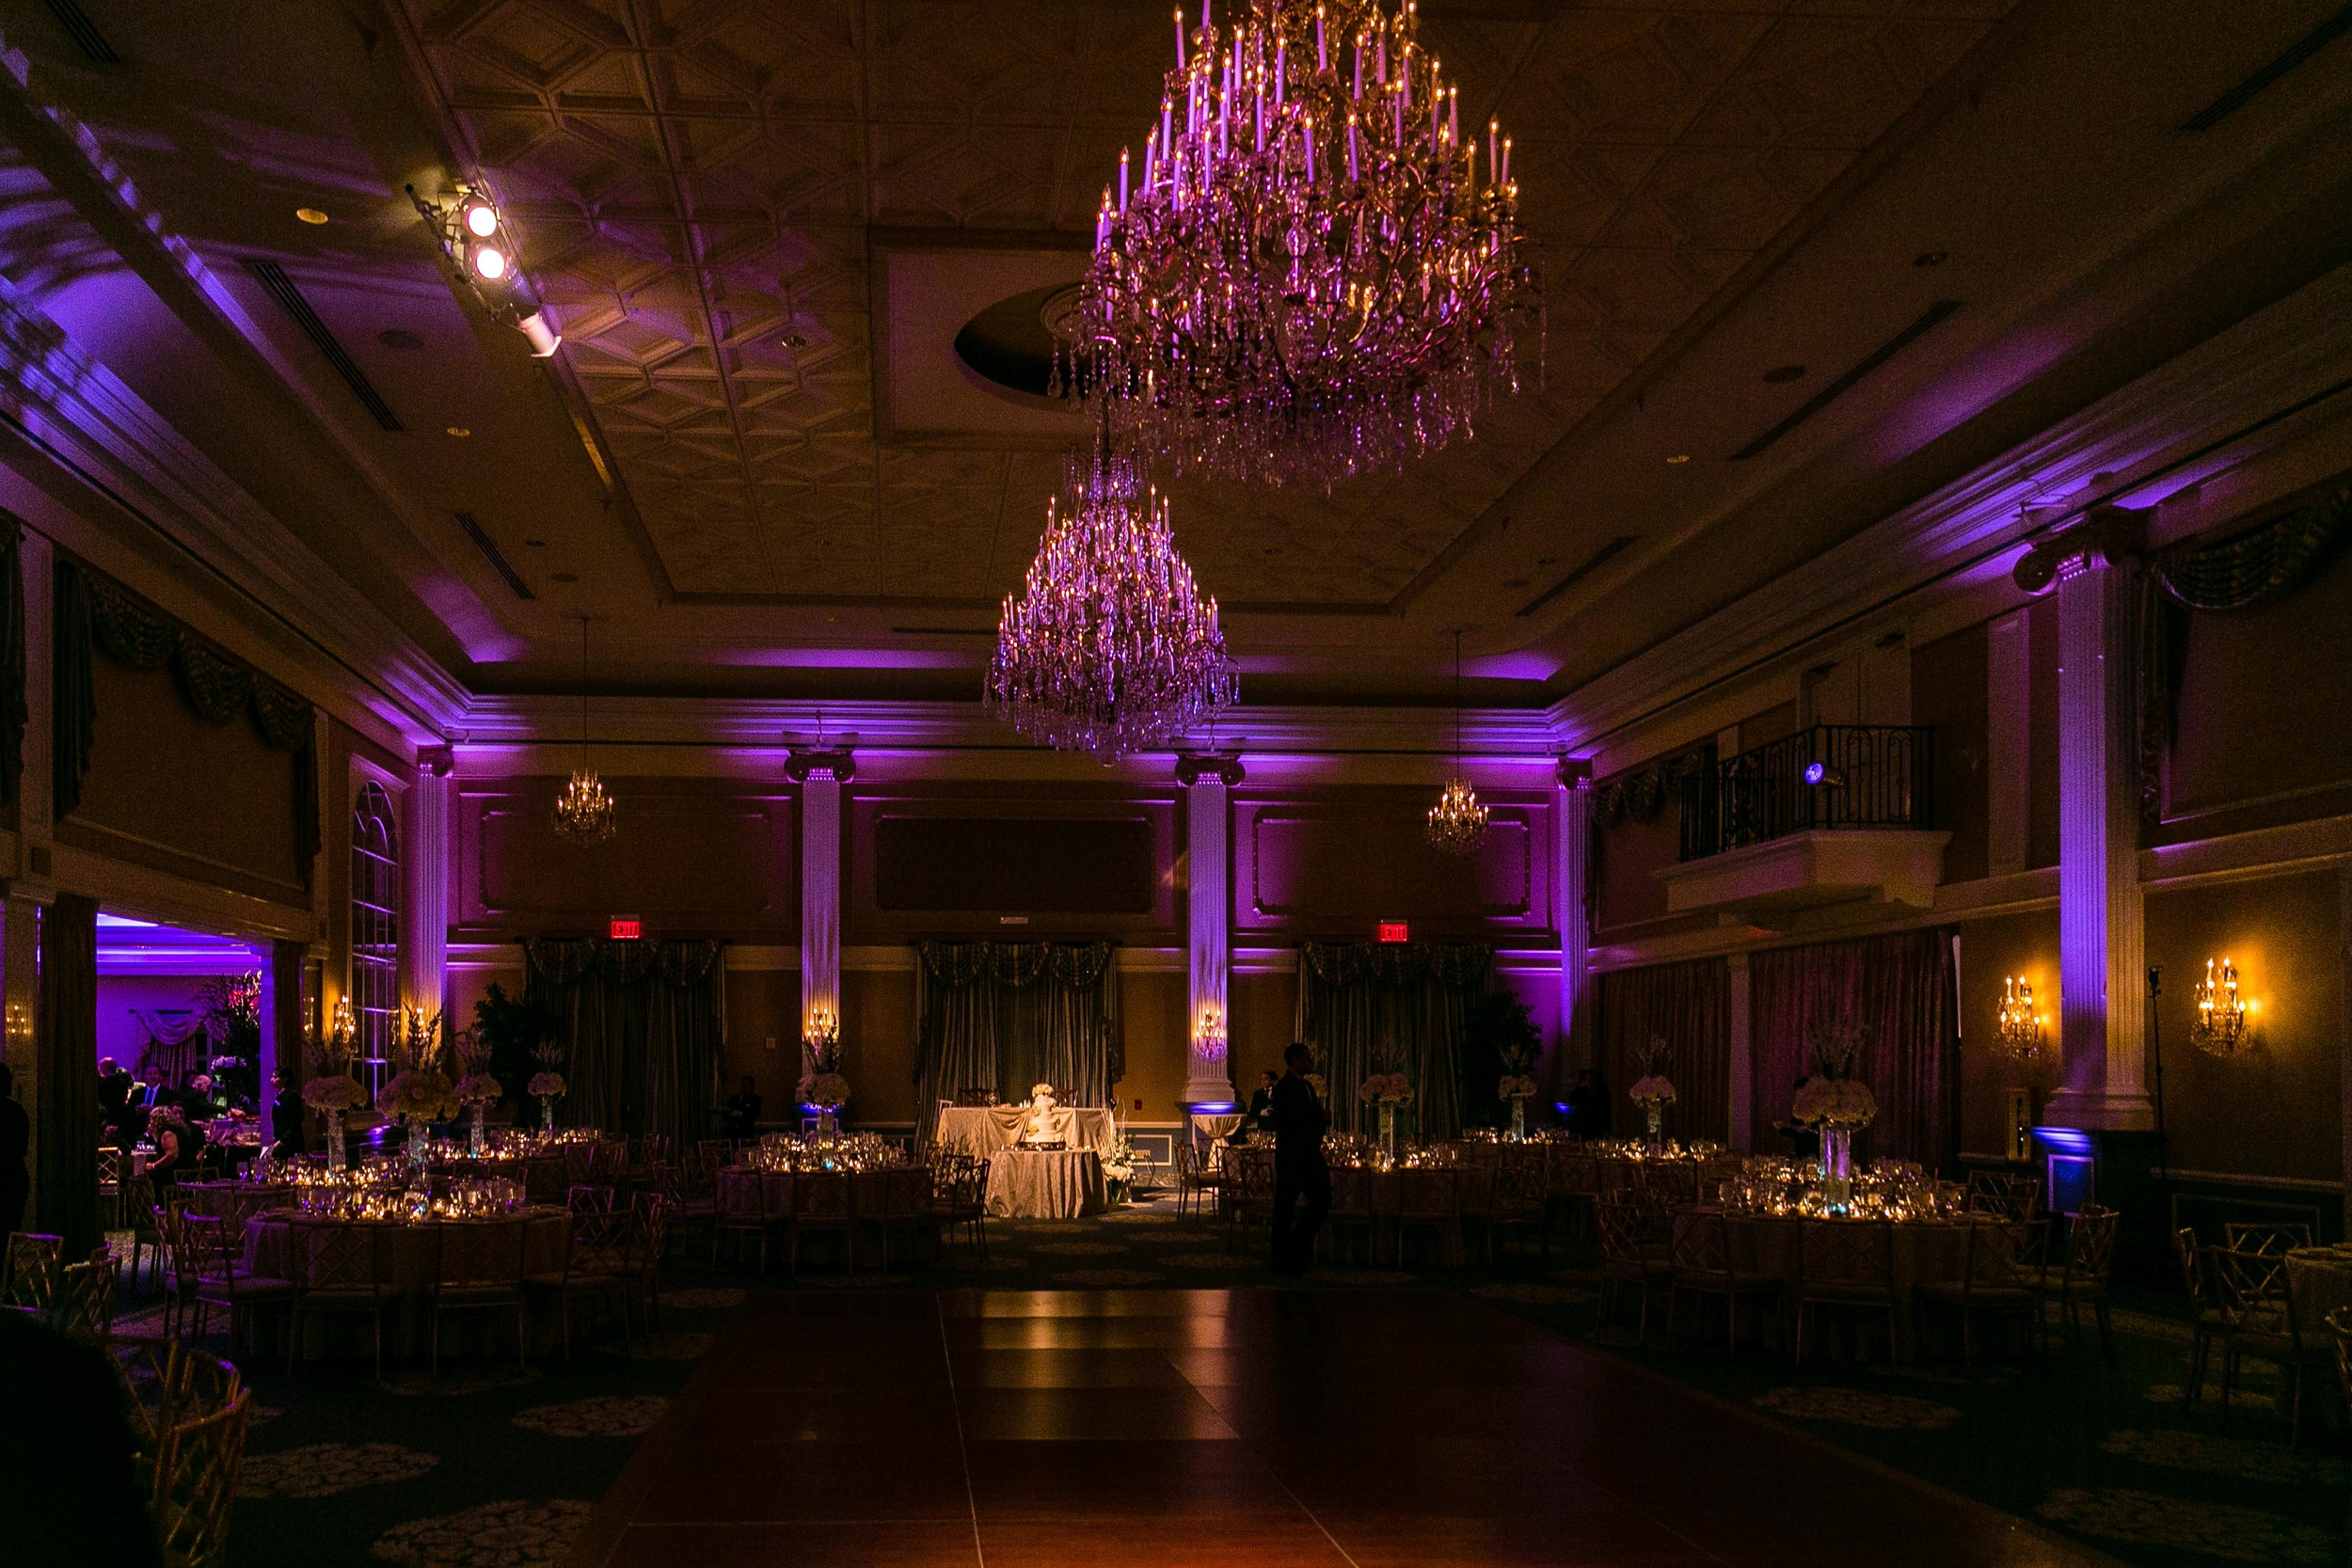 Russian-Jewish-Italian-Luxury-Wedding-The-Palace-at-Somerset-Park-NJ-Documentary-Wedding-Photography-3.jpg